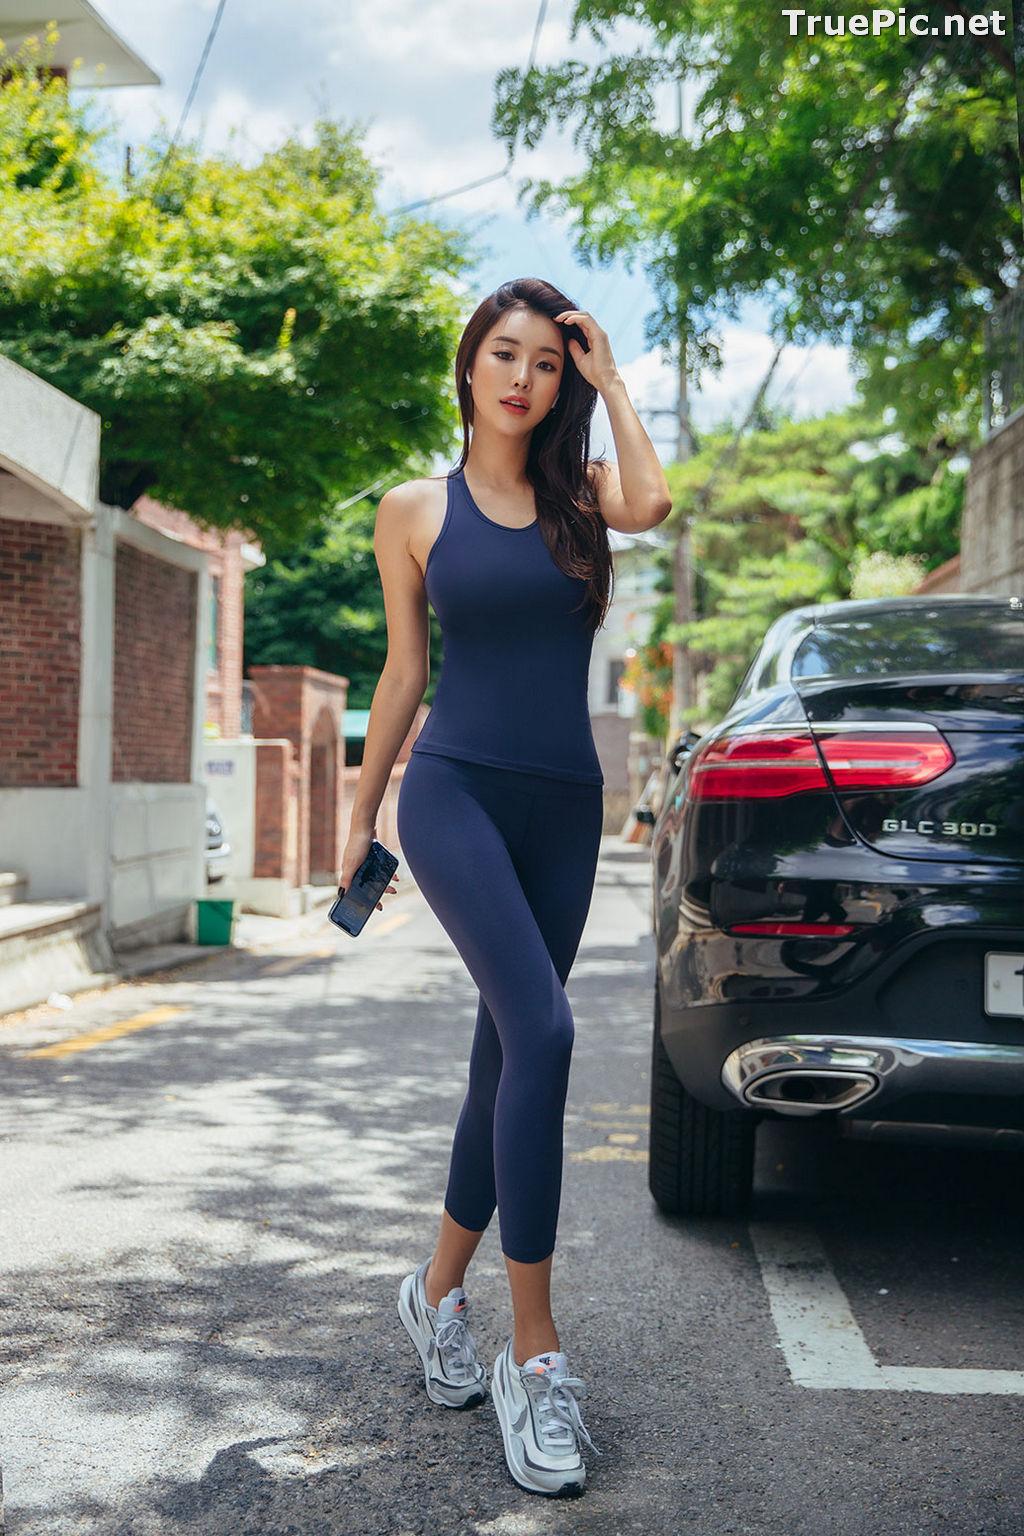 Image Korean Fashion Model - Park Da Hyun - Navy Sportswear - TruePic.net - Picture-9